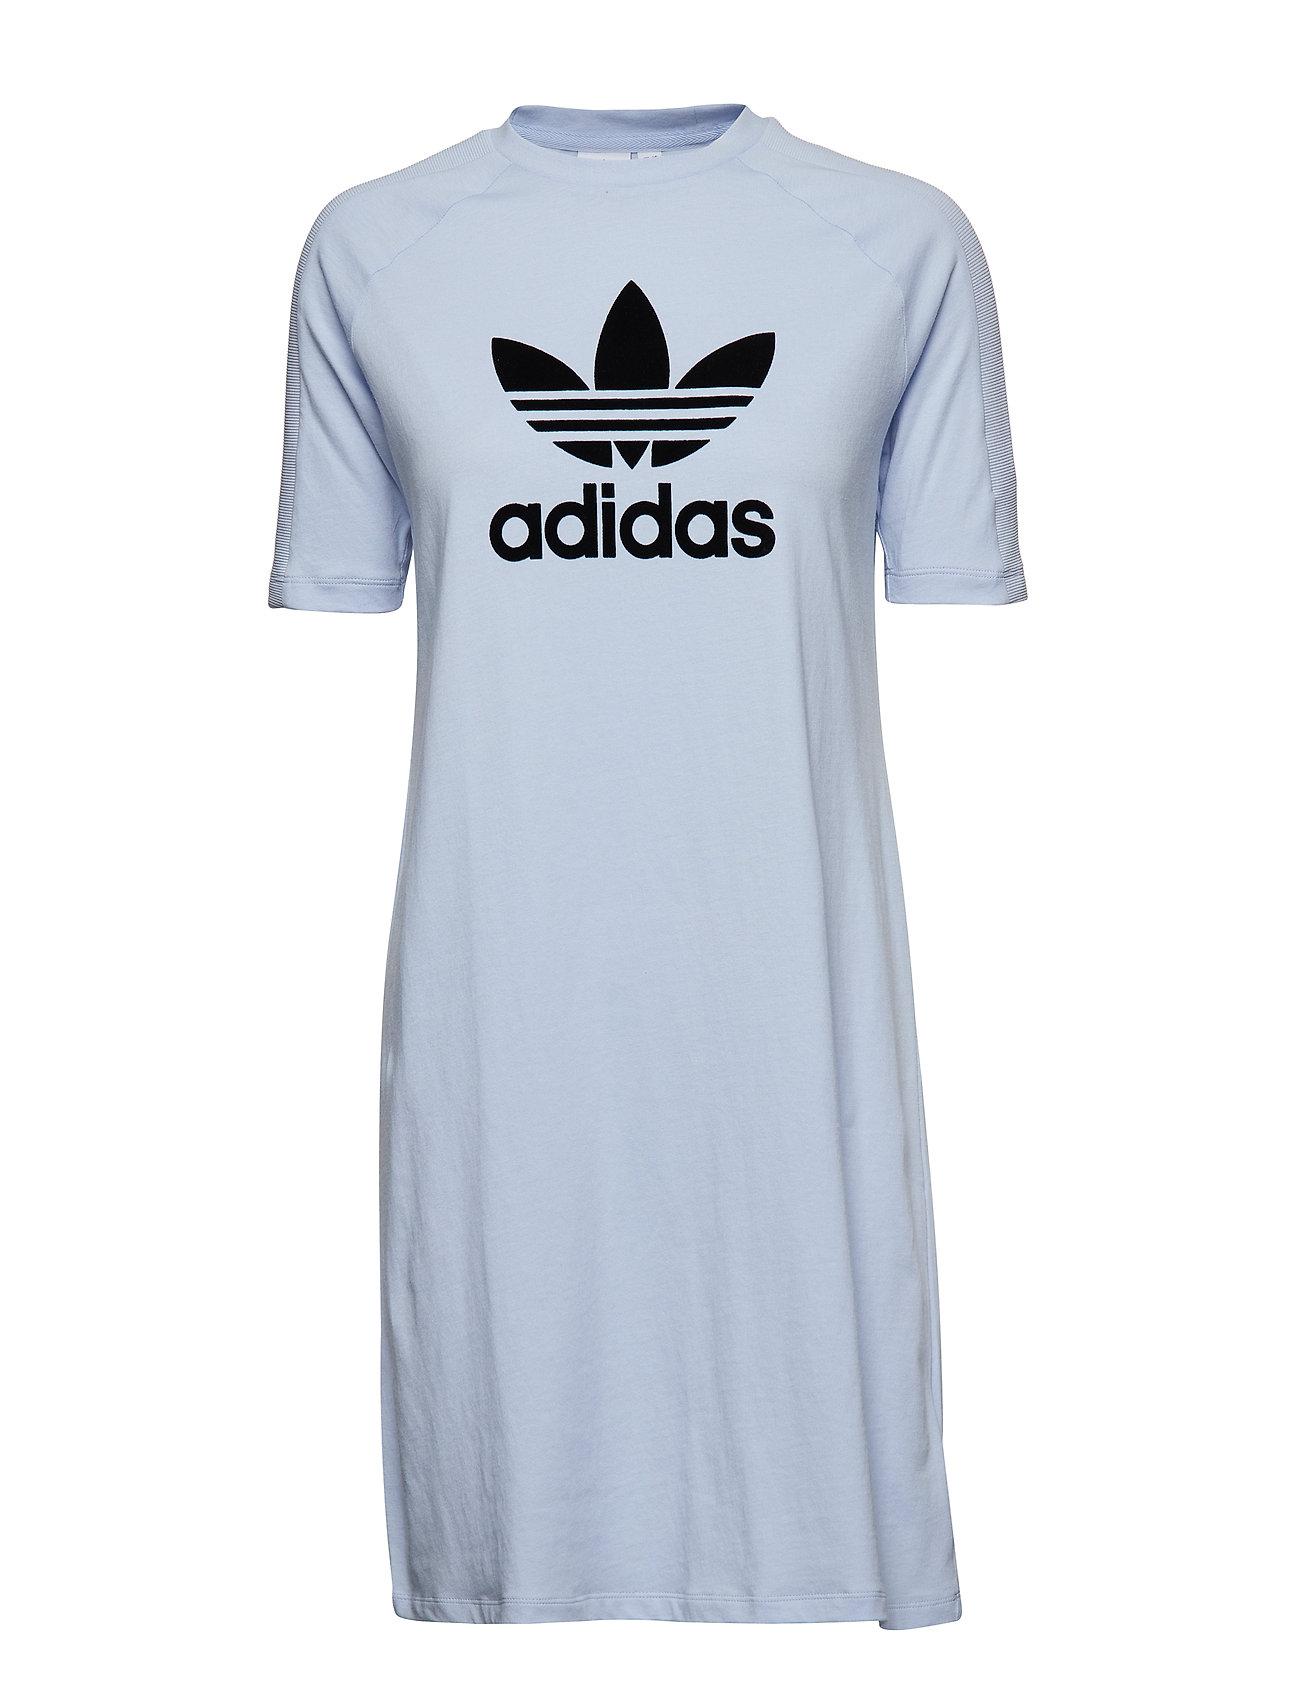 86772b6d Adidas korte kjoler – Tee Dress til dame i PERIWI - Pashion.dk